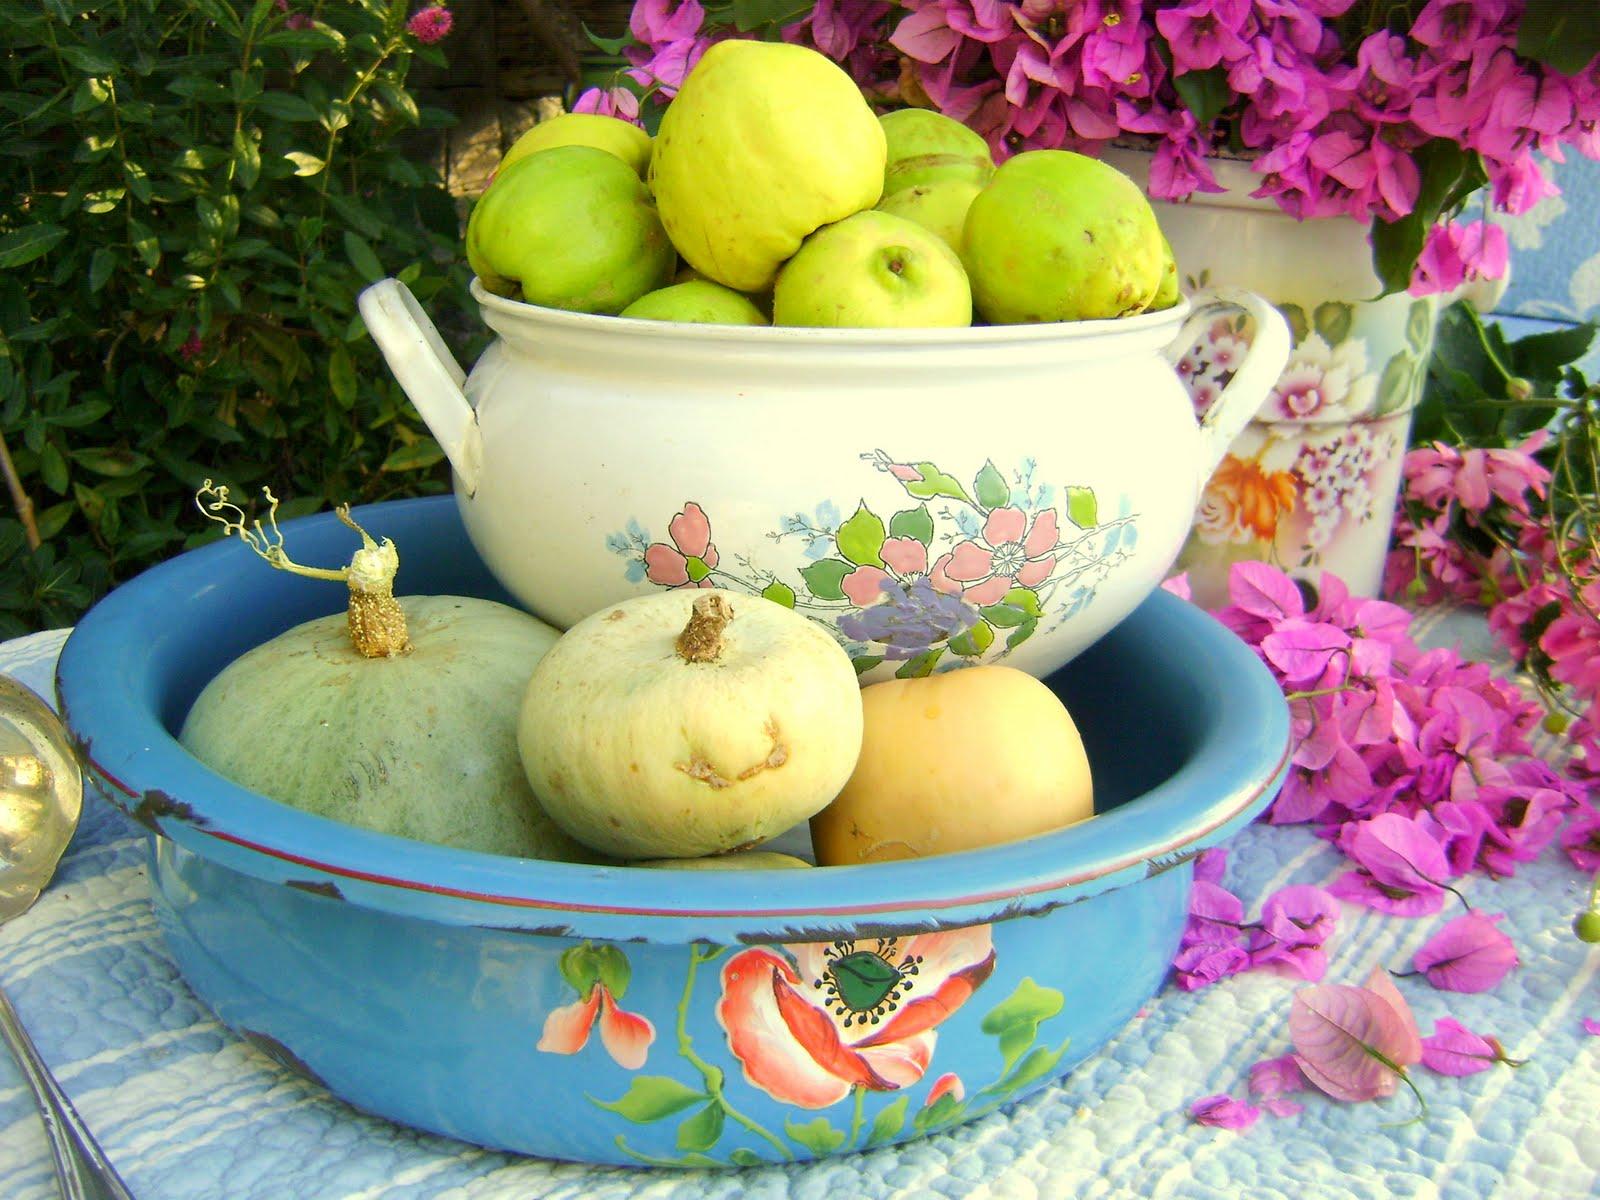 Paradis express casa dulce hogar for Dulce hogar villalba